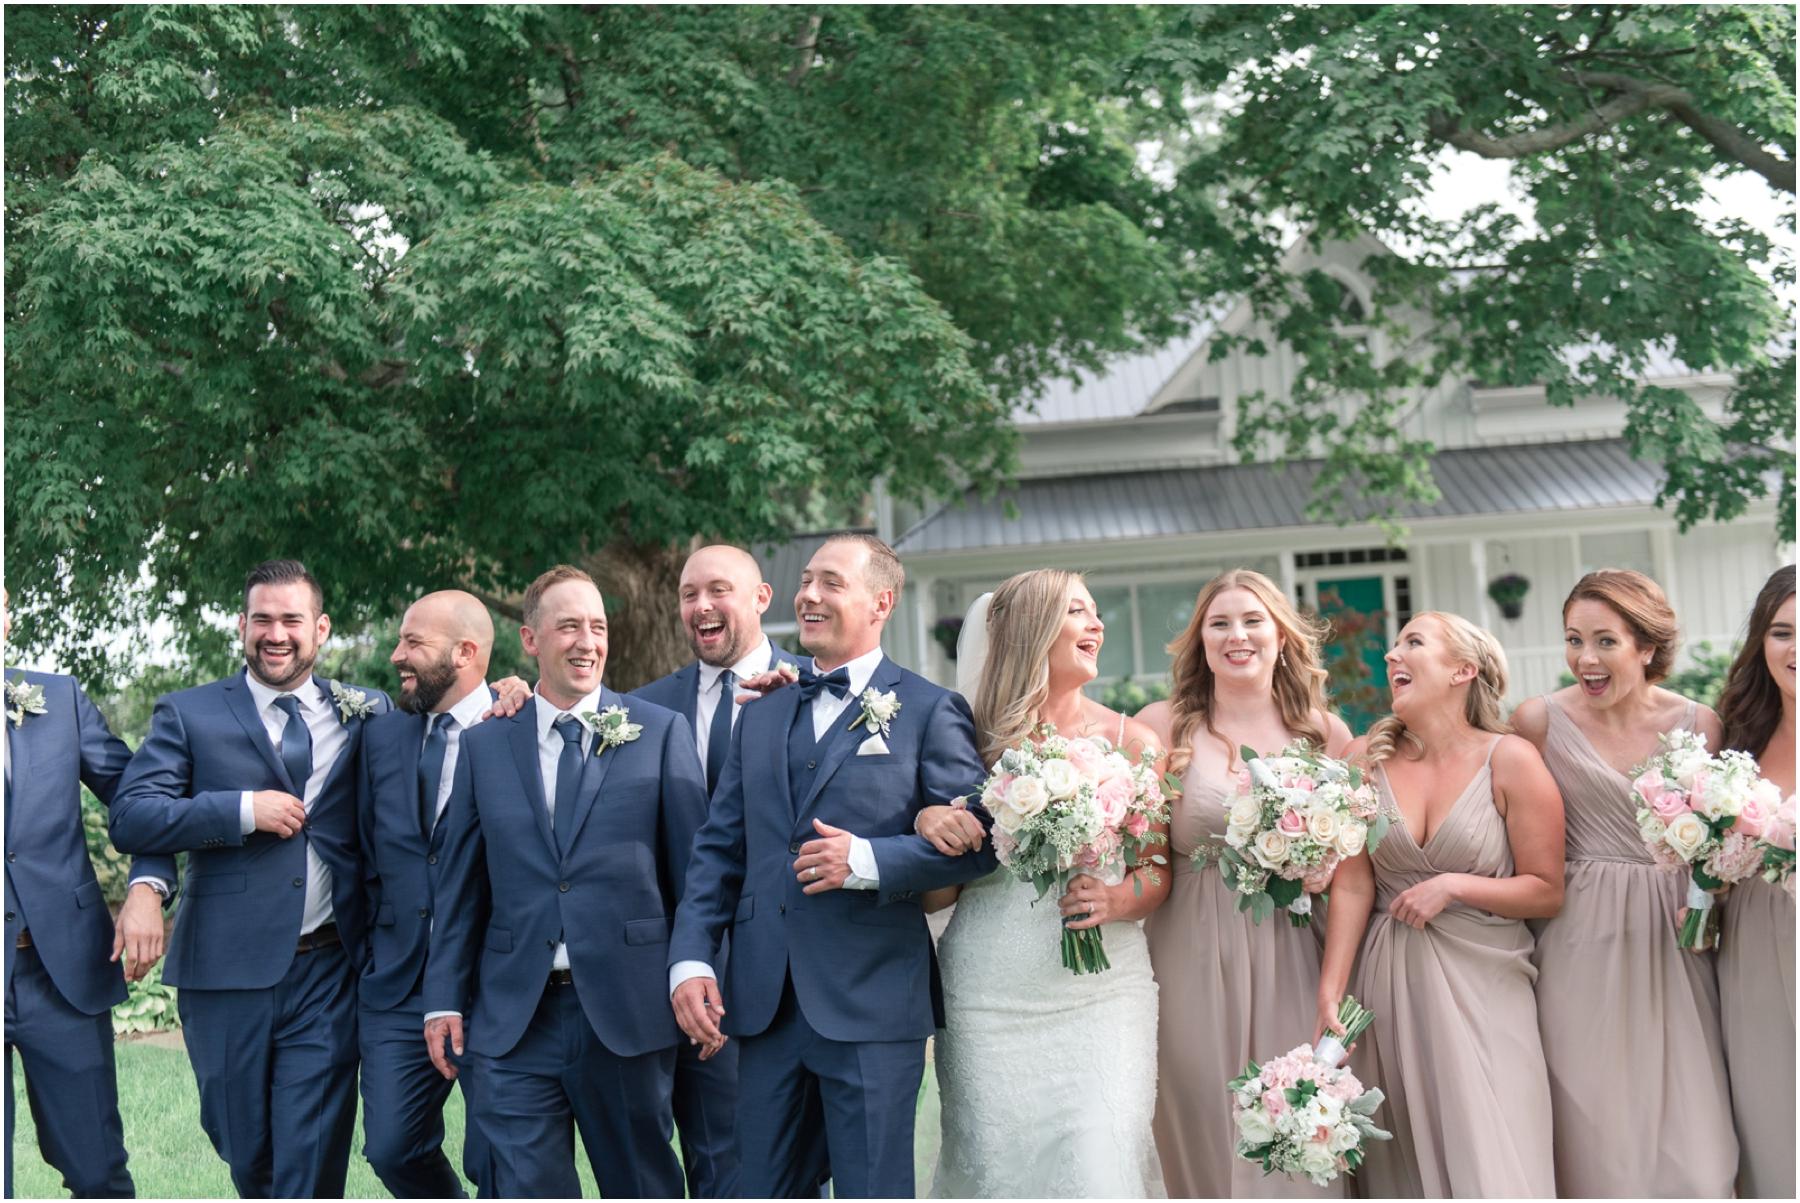 Bloom Field Gardens Wedding Precious Photography Katherine & Chris_063